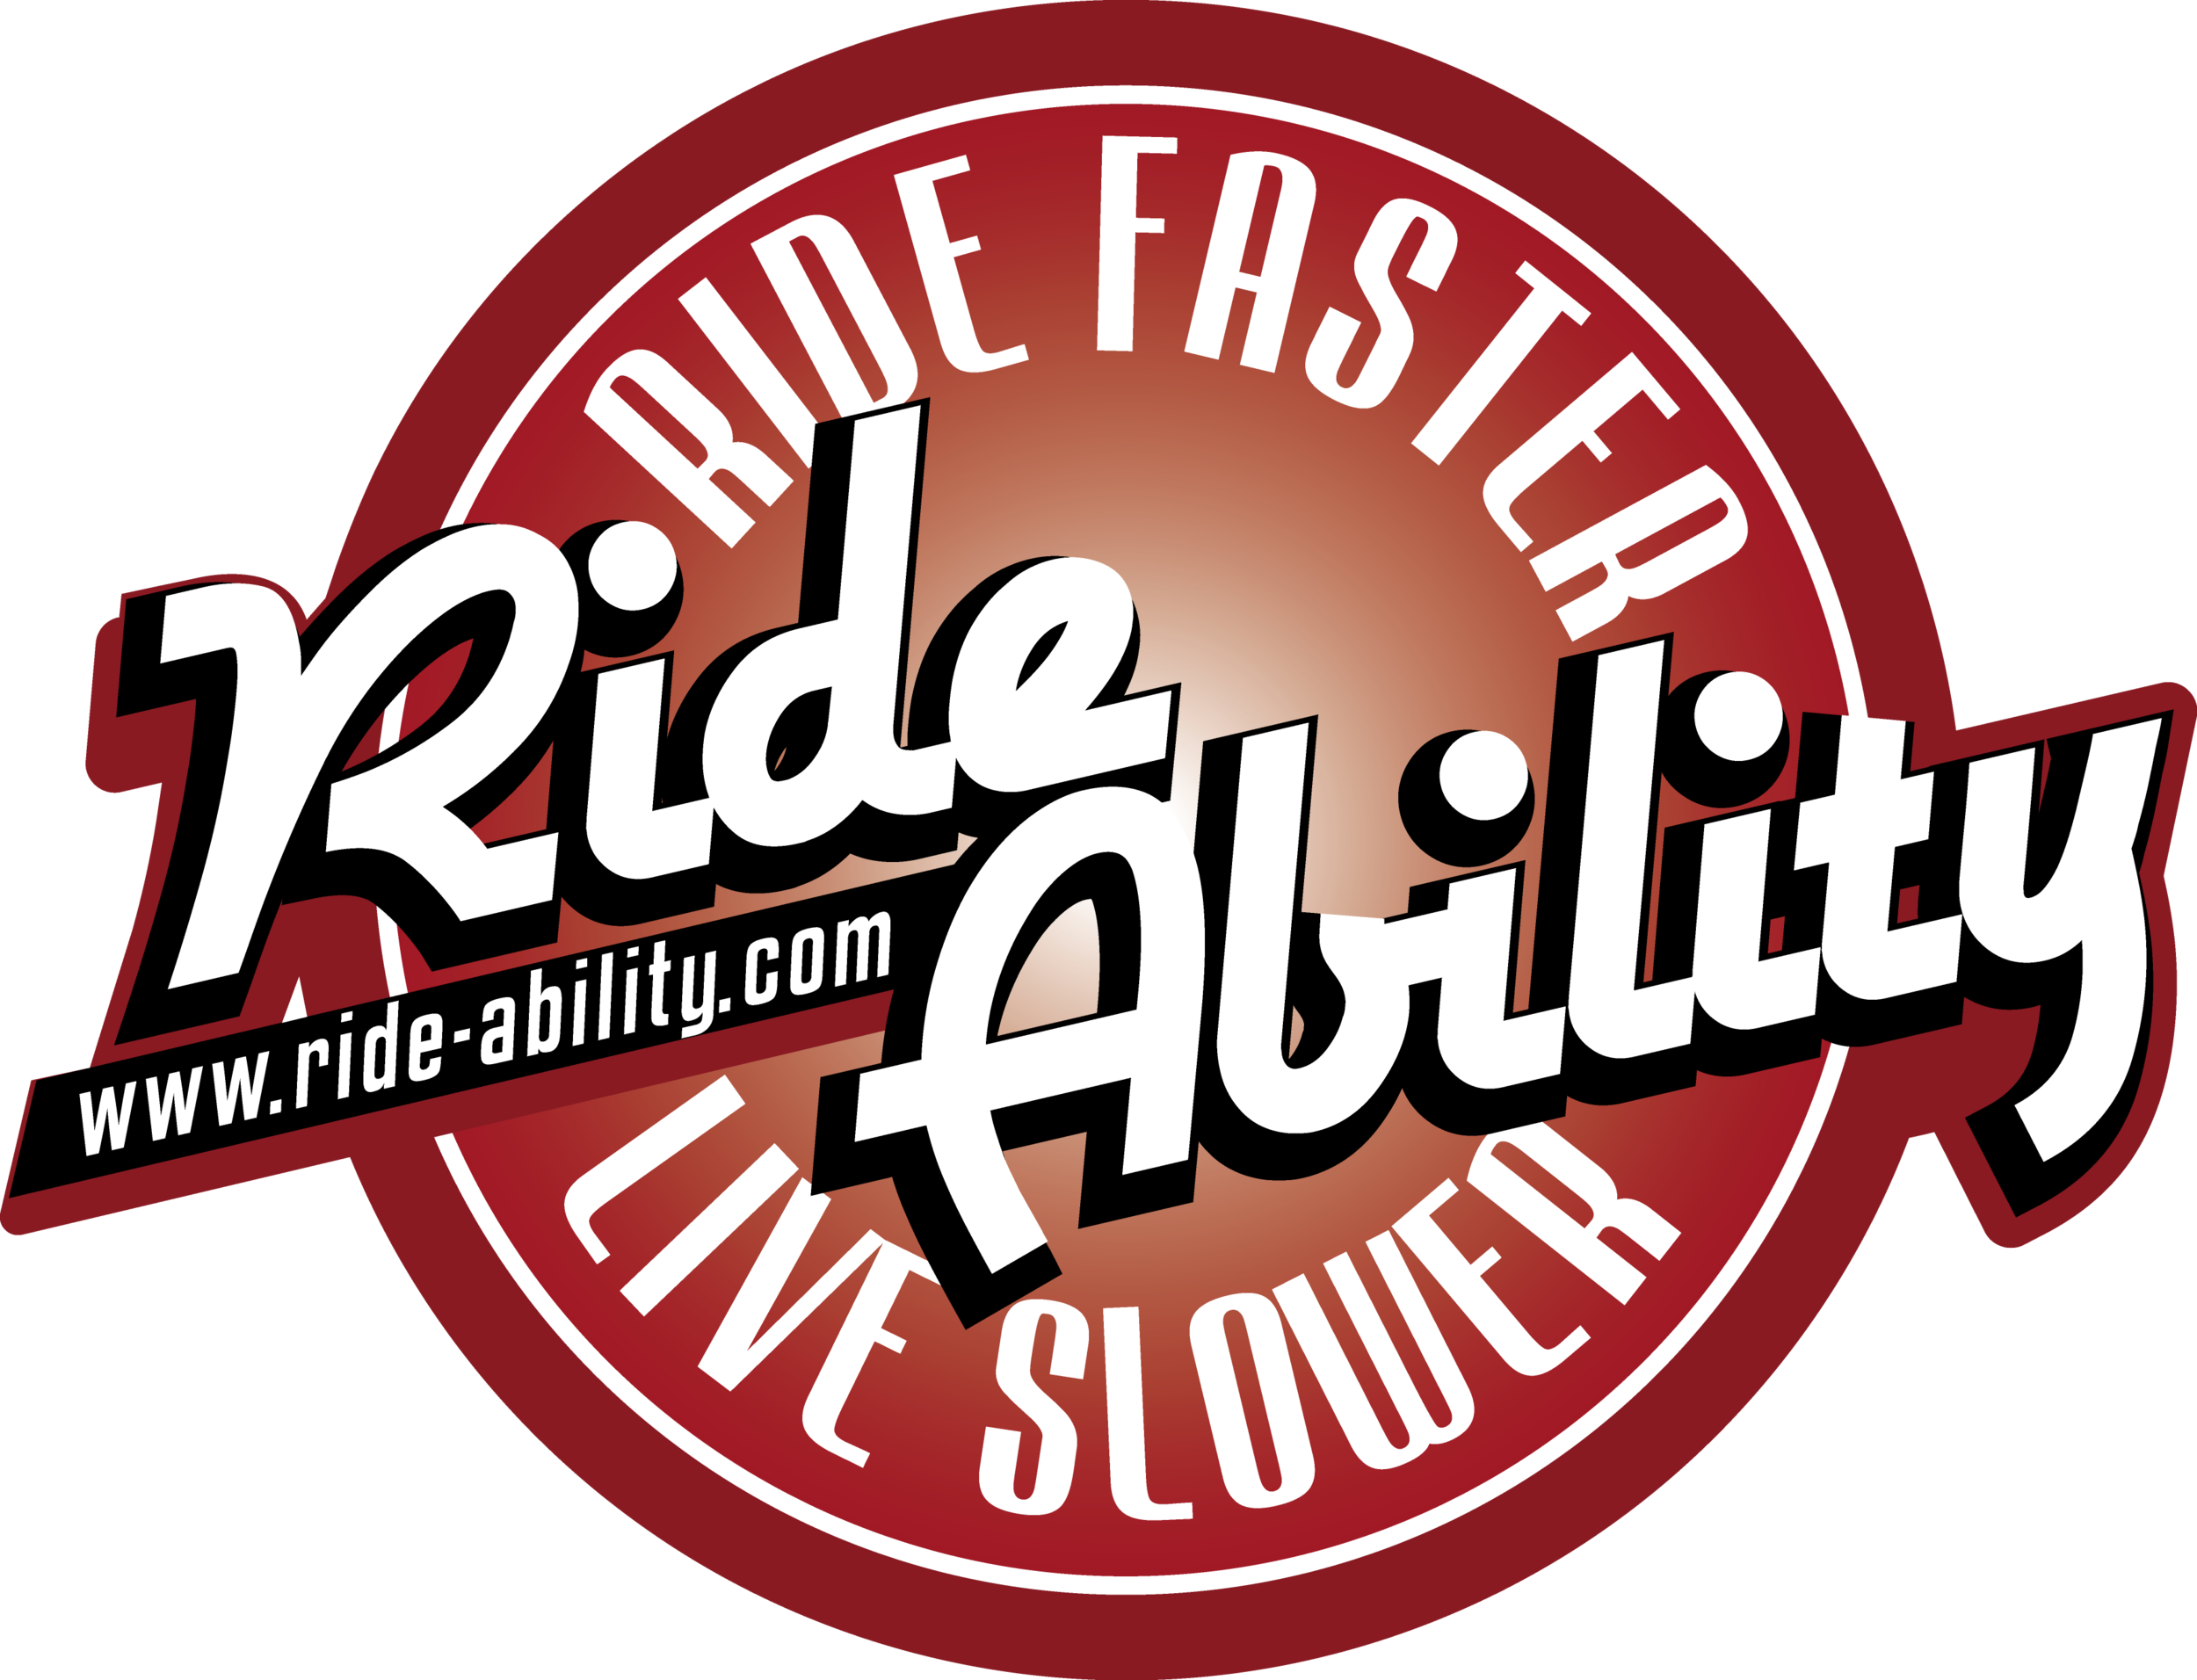 RideabilityLogo 2018.png